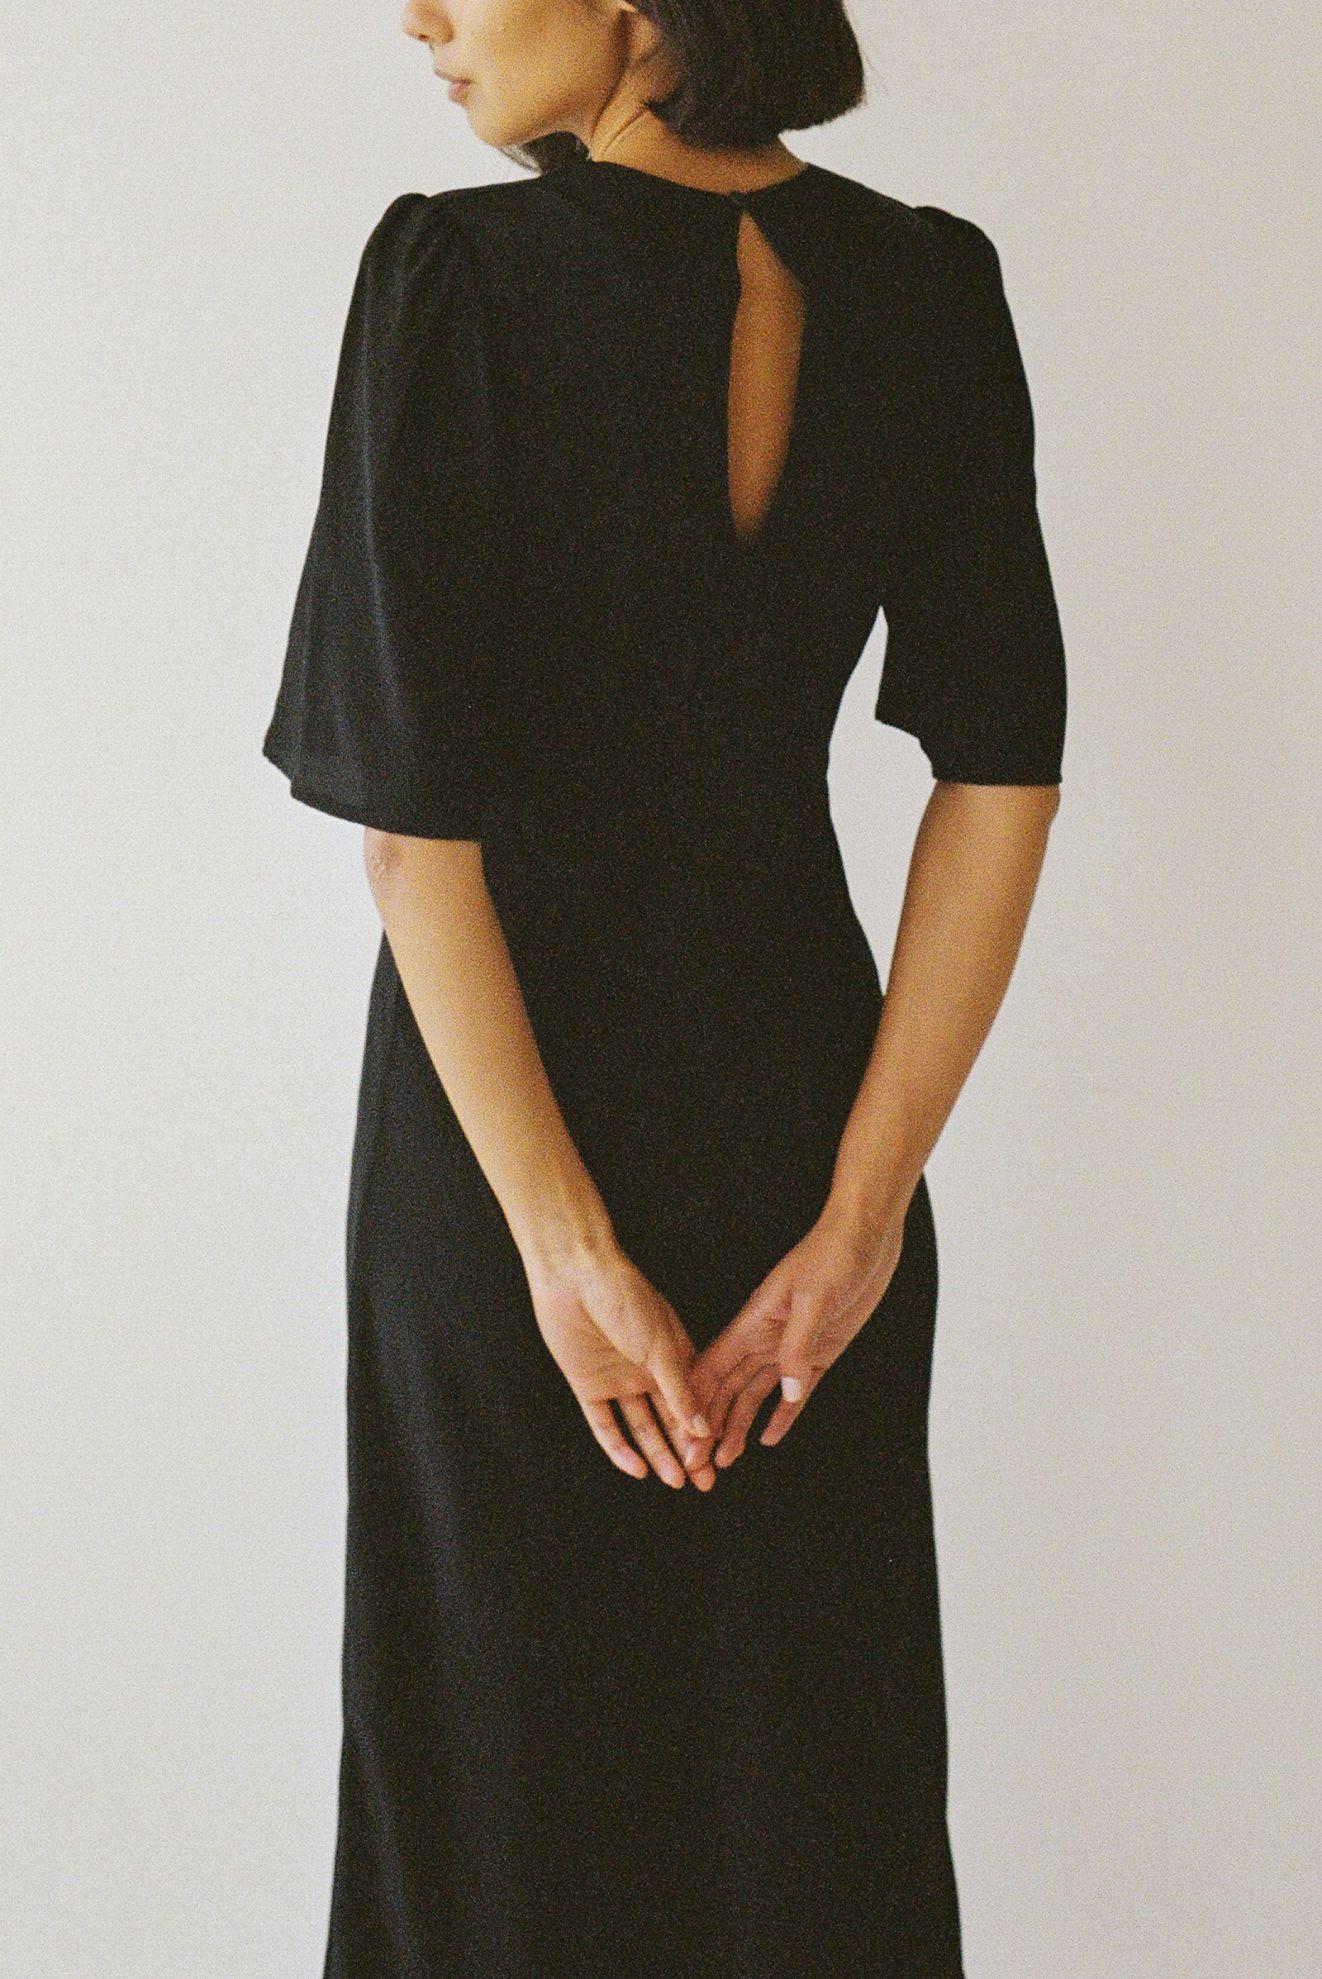 Paloma deux dress - Black silk - Ellis Label - Womens designer clothing_0052_82980030